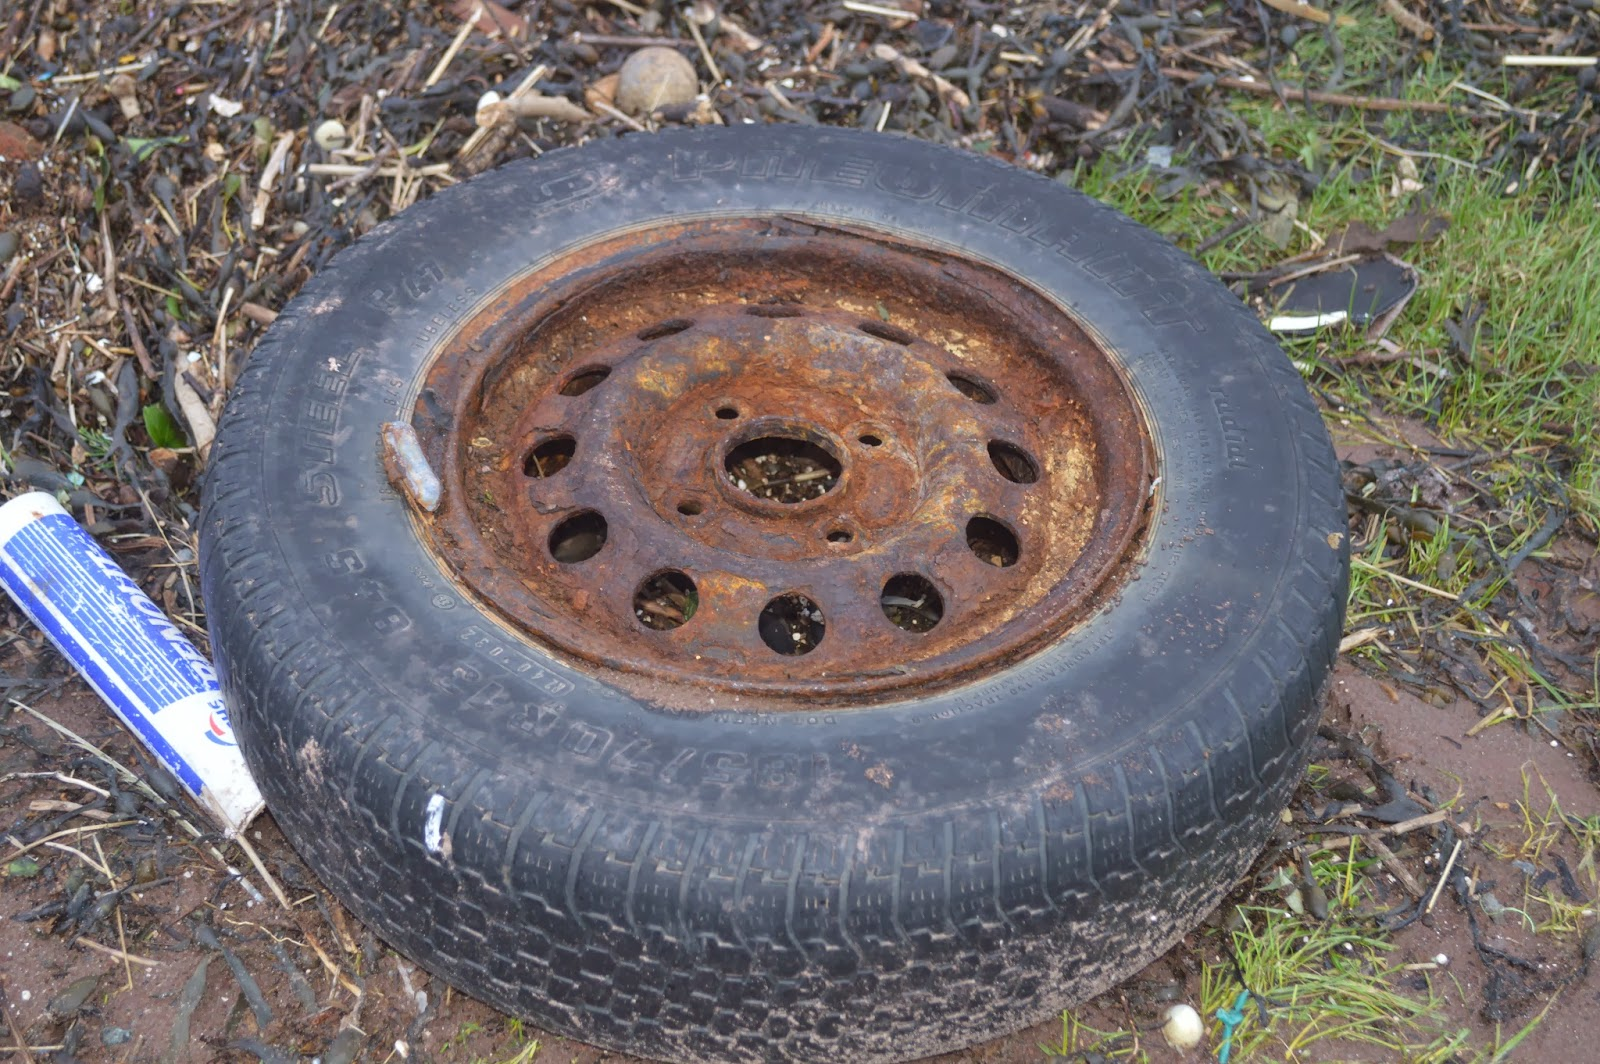 Country Kids Gelliswick Beach The Fort Hakin Milford Haven tyre